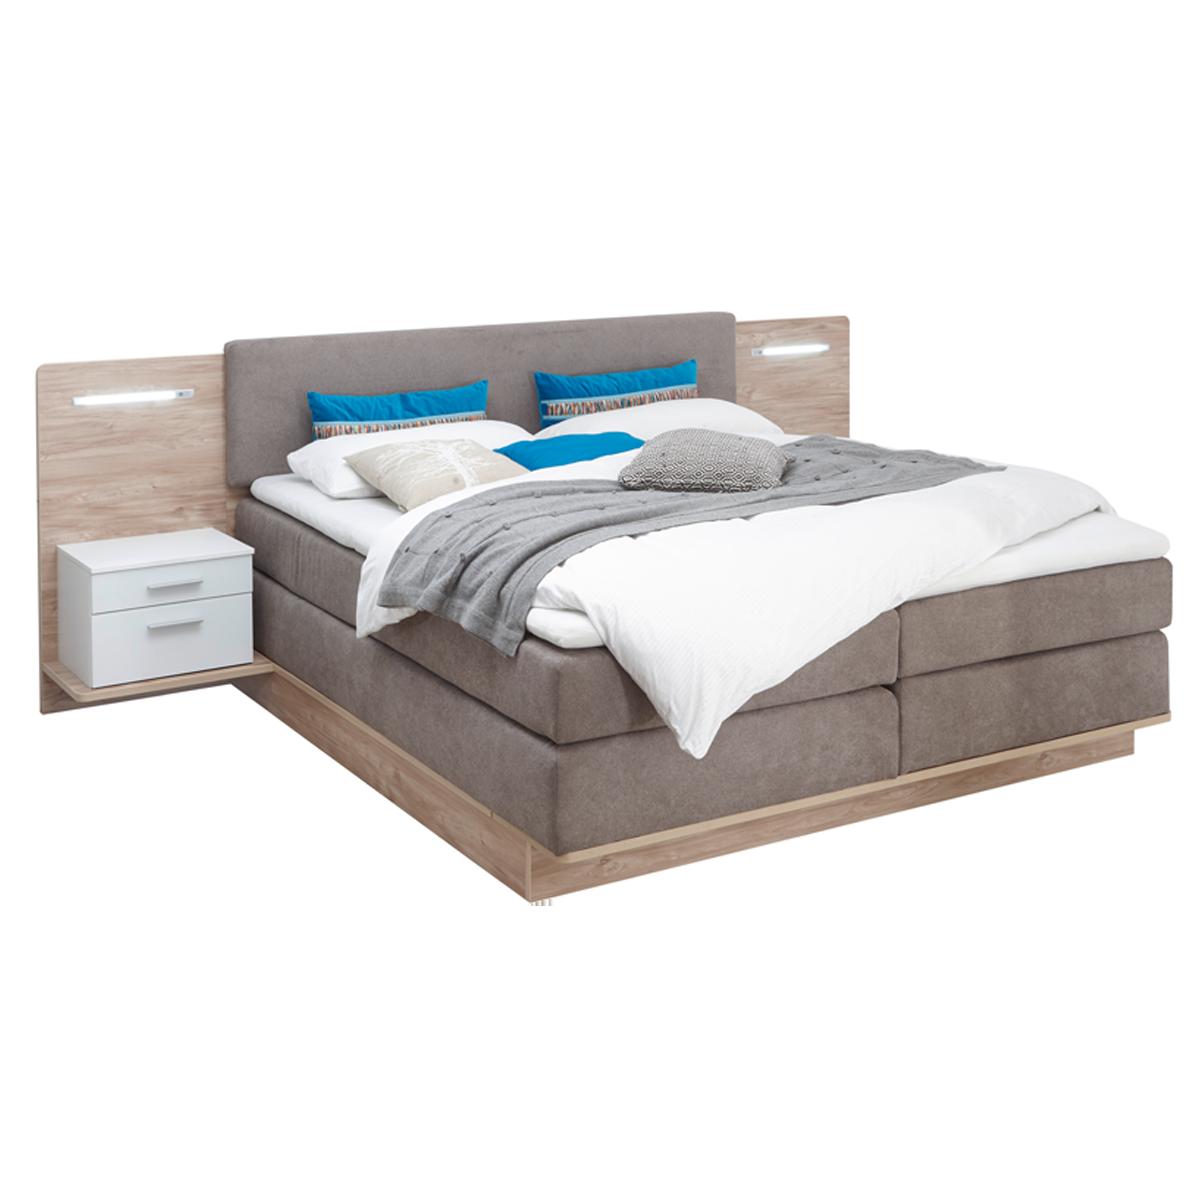 Schlafkontor Malibu Boxspringbett Mit Zwei Paneel Nachtkommoden Inkl Led Beleuchtung Liegefläche Ca 180x200 Cm